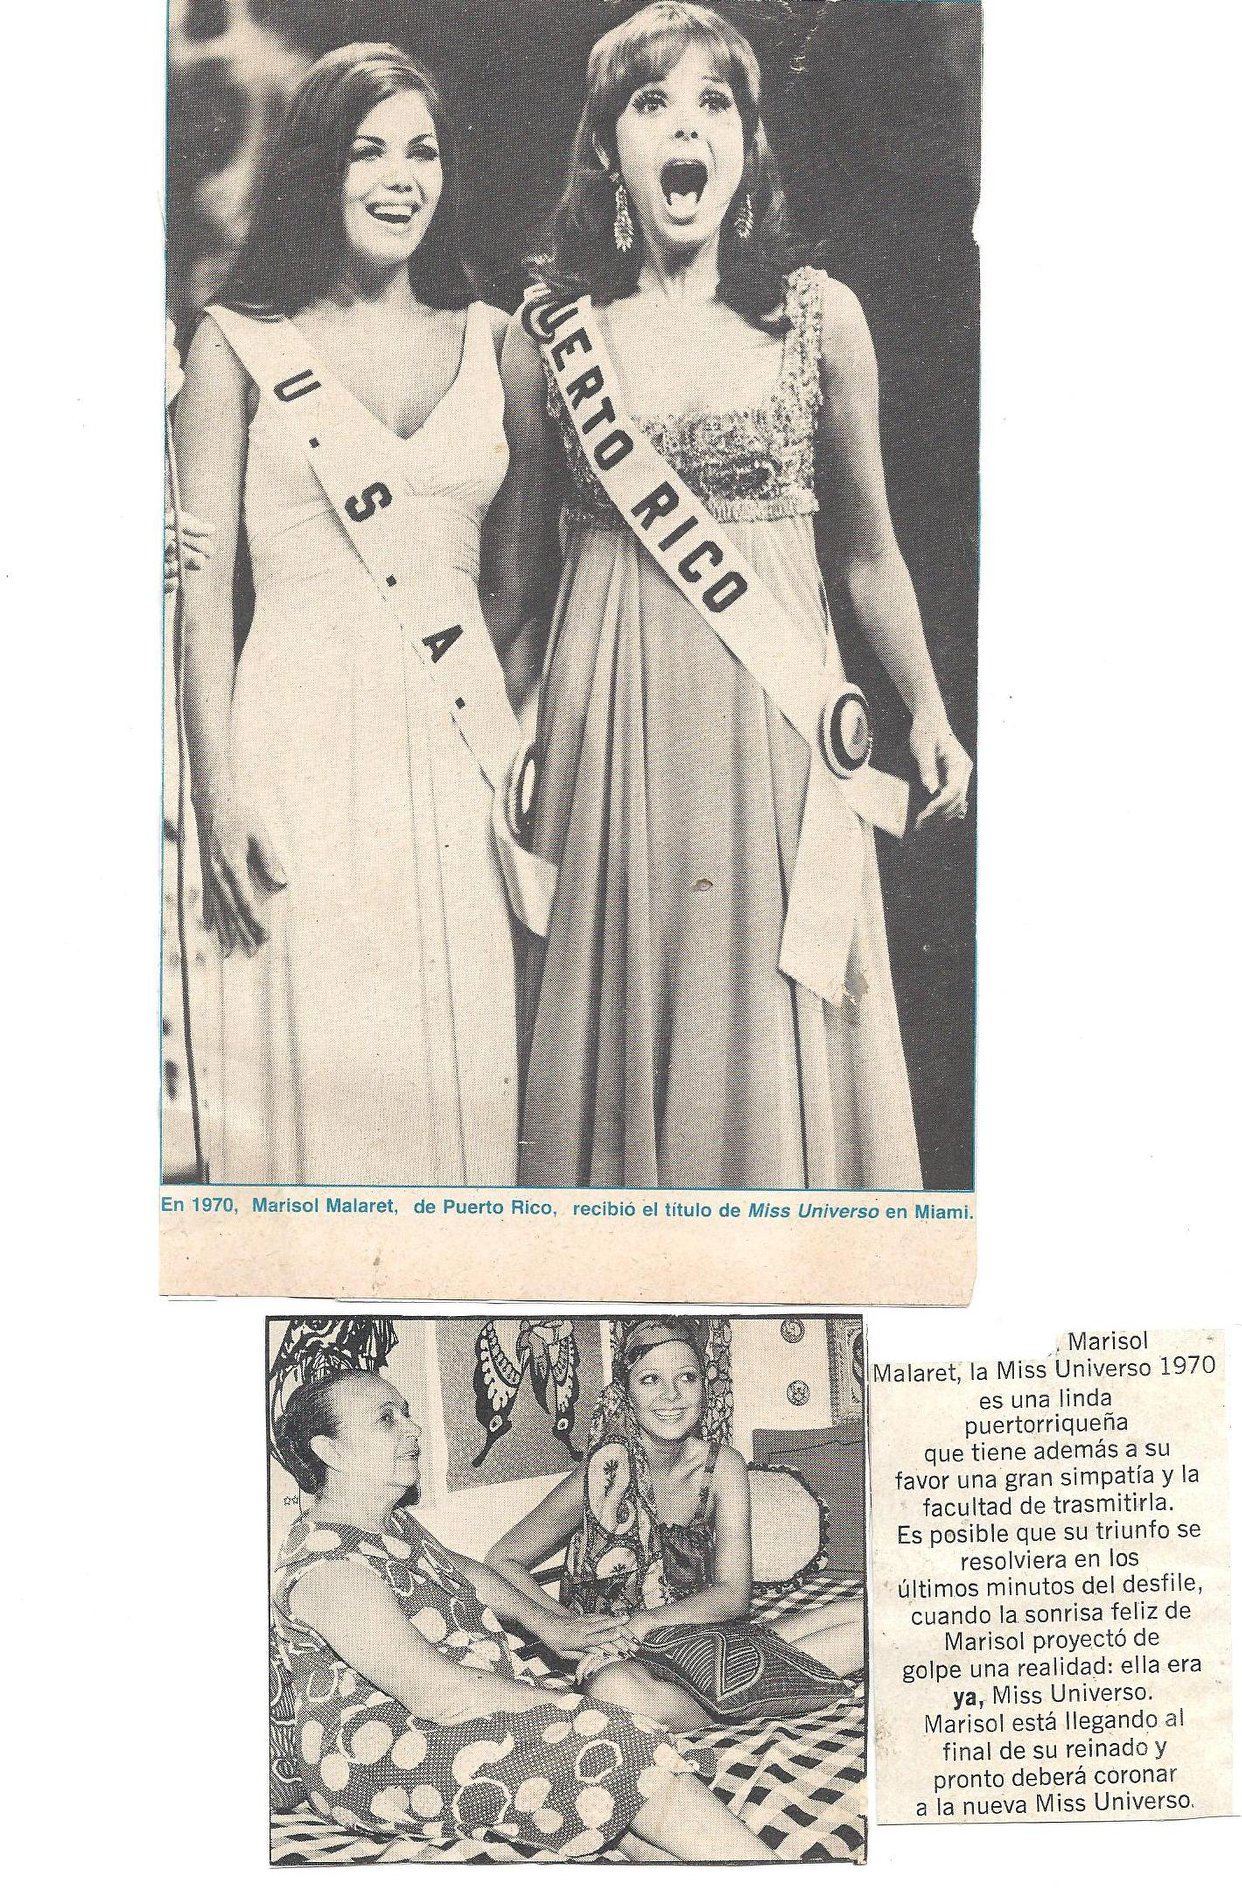 marisol malaret, miss universe 1970. - Página 7 62042210